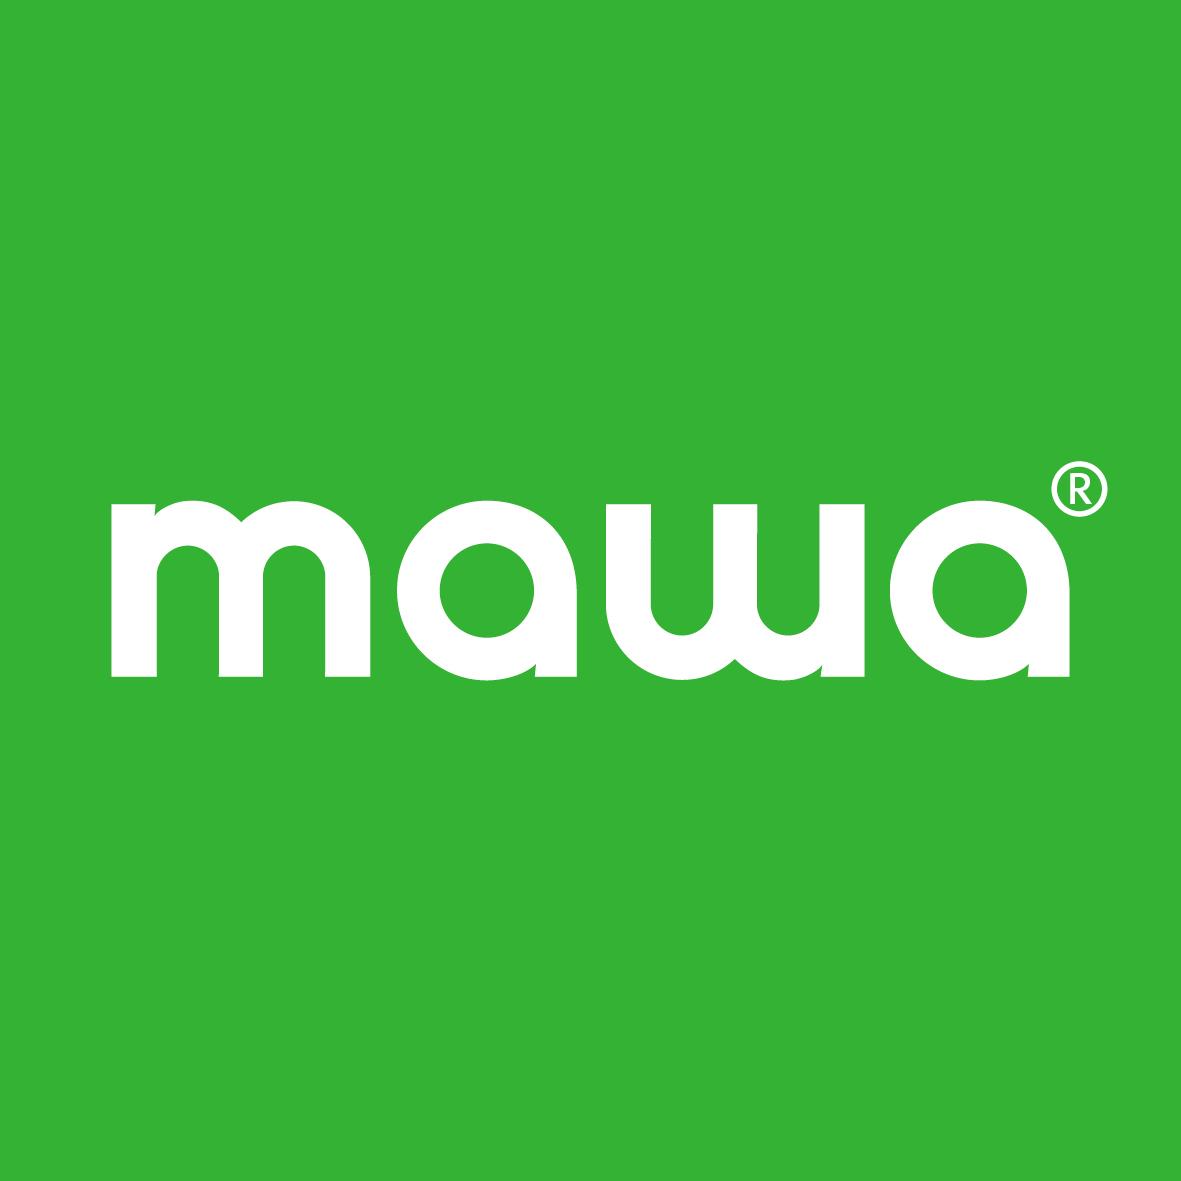 Logo mawa design